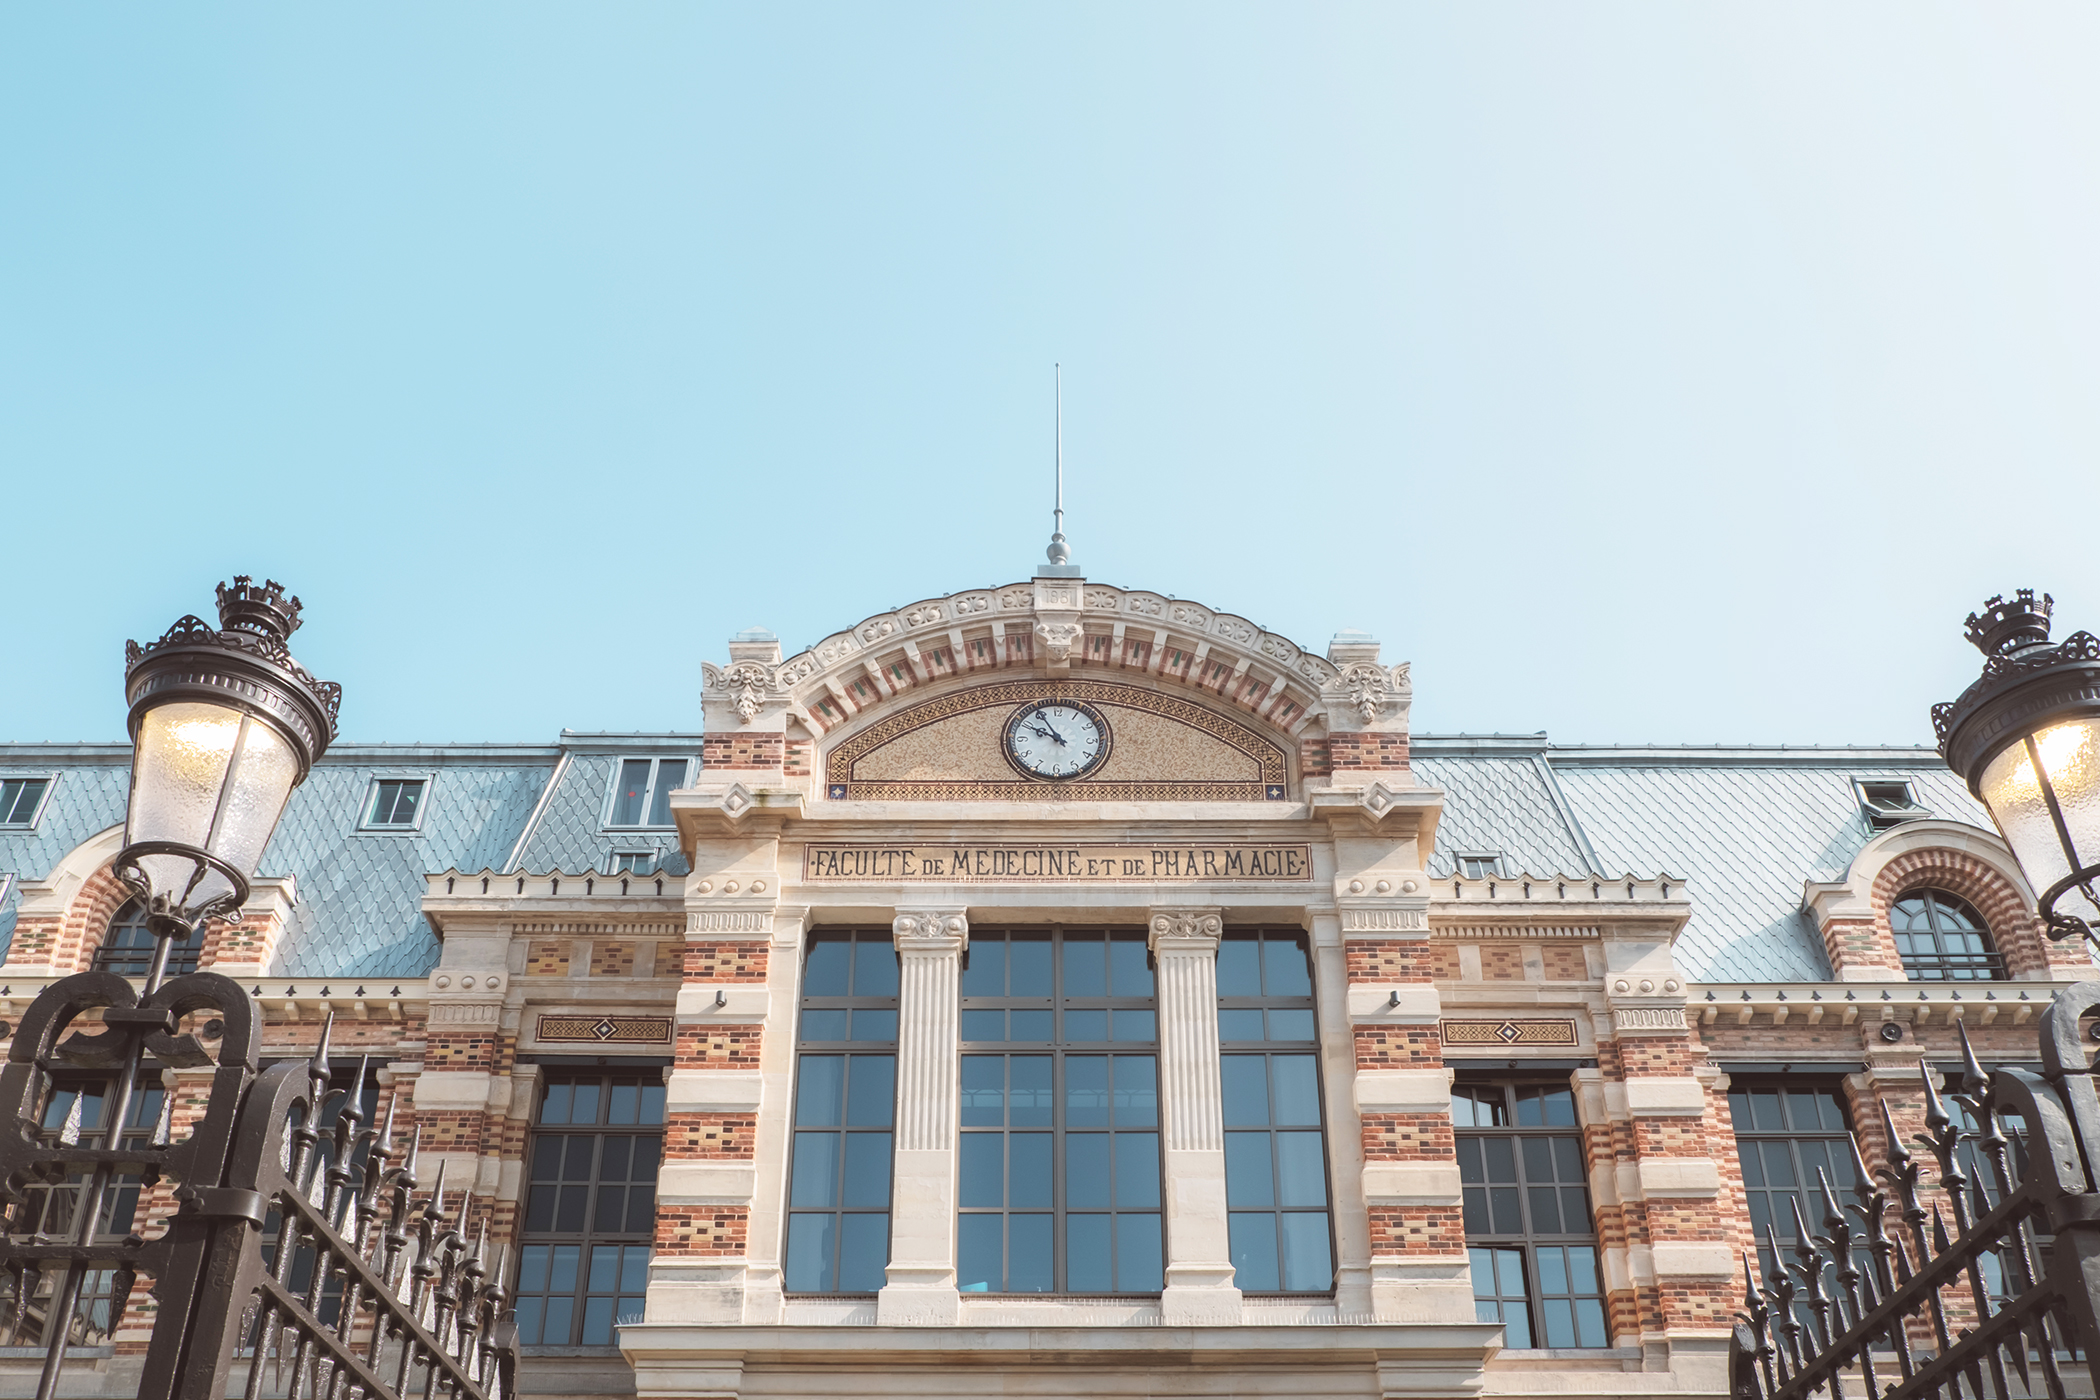 La façade du Moxy Hôtel